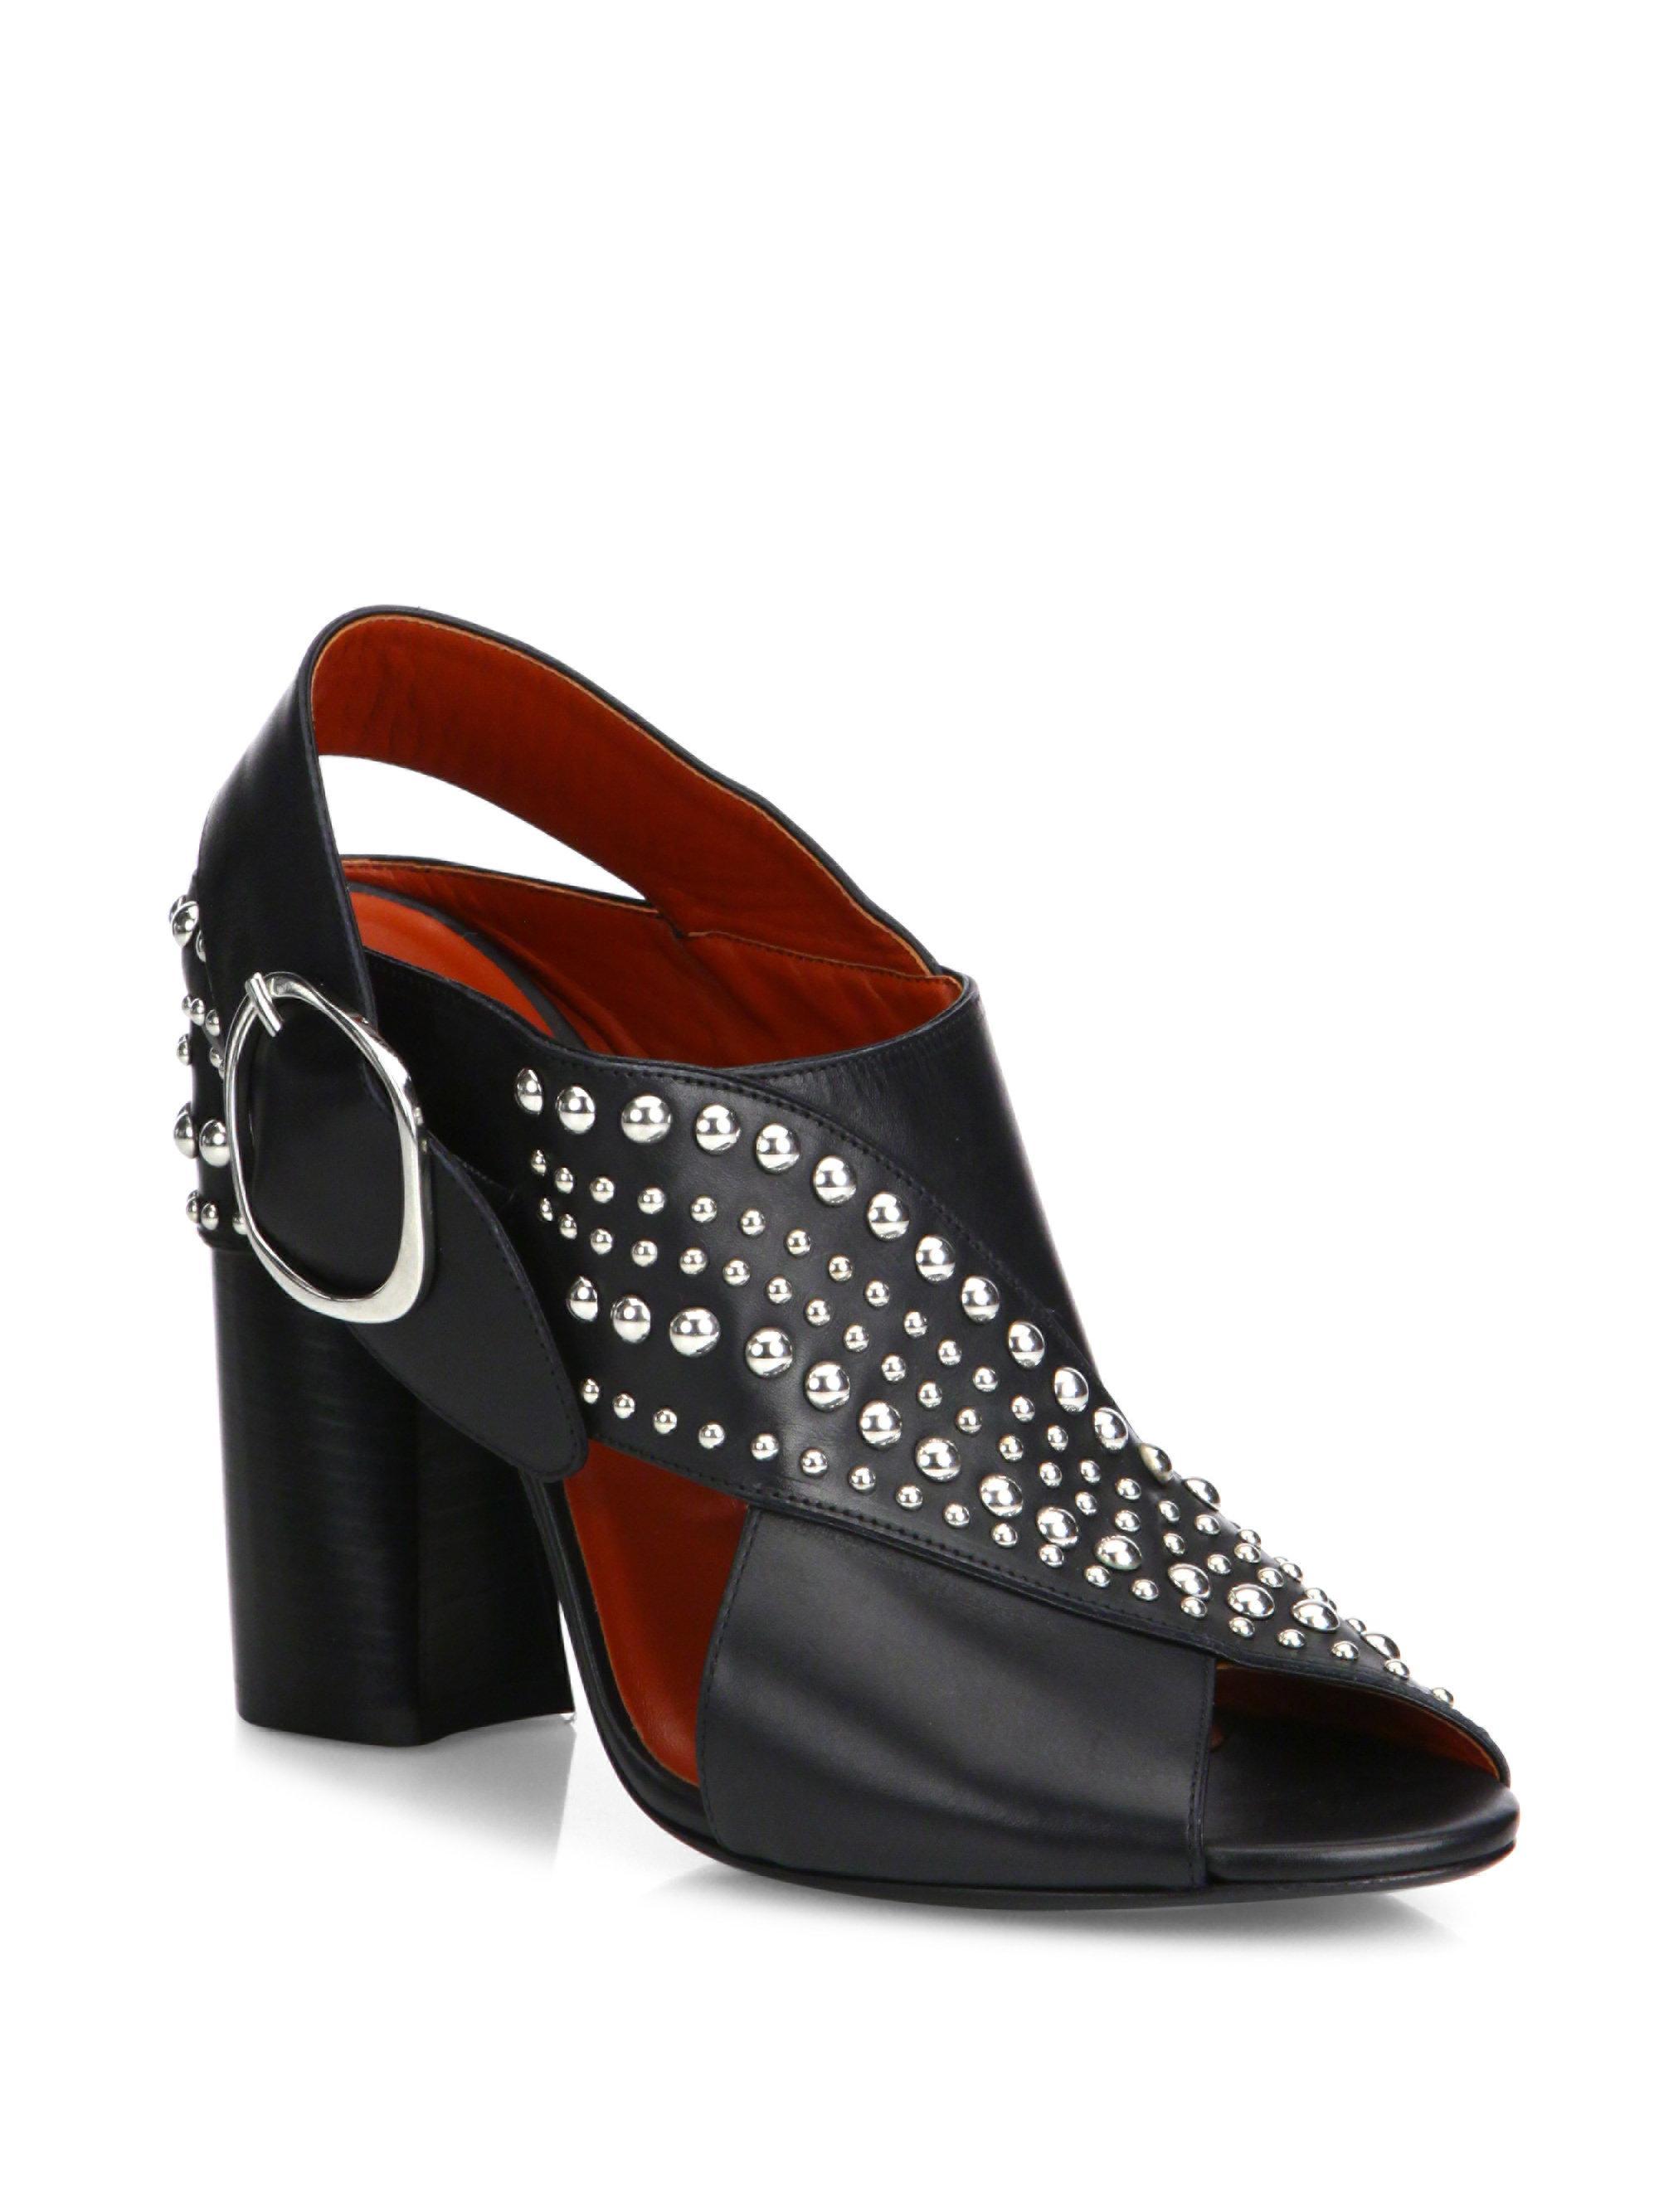 3.1 Phillip Lim. Women's Black Patsy Studded Crisscross Leather Block Heel  Slingback Sandals